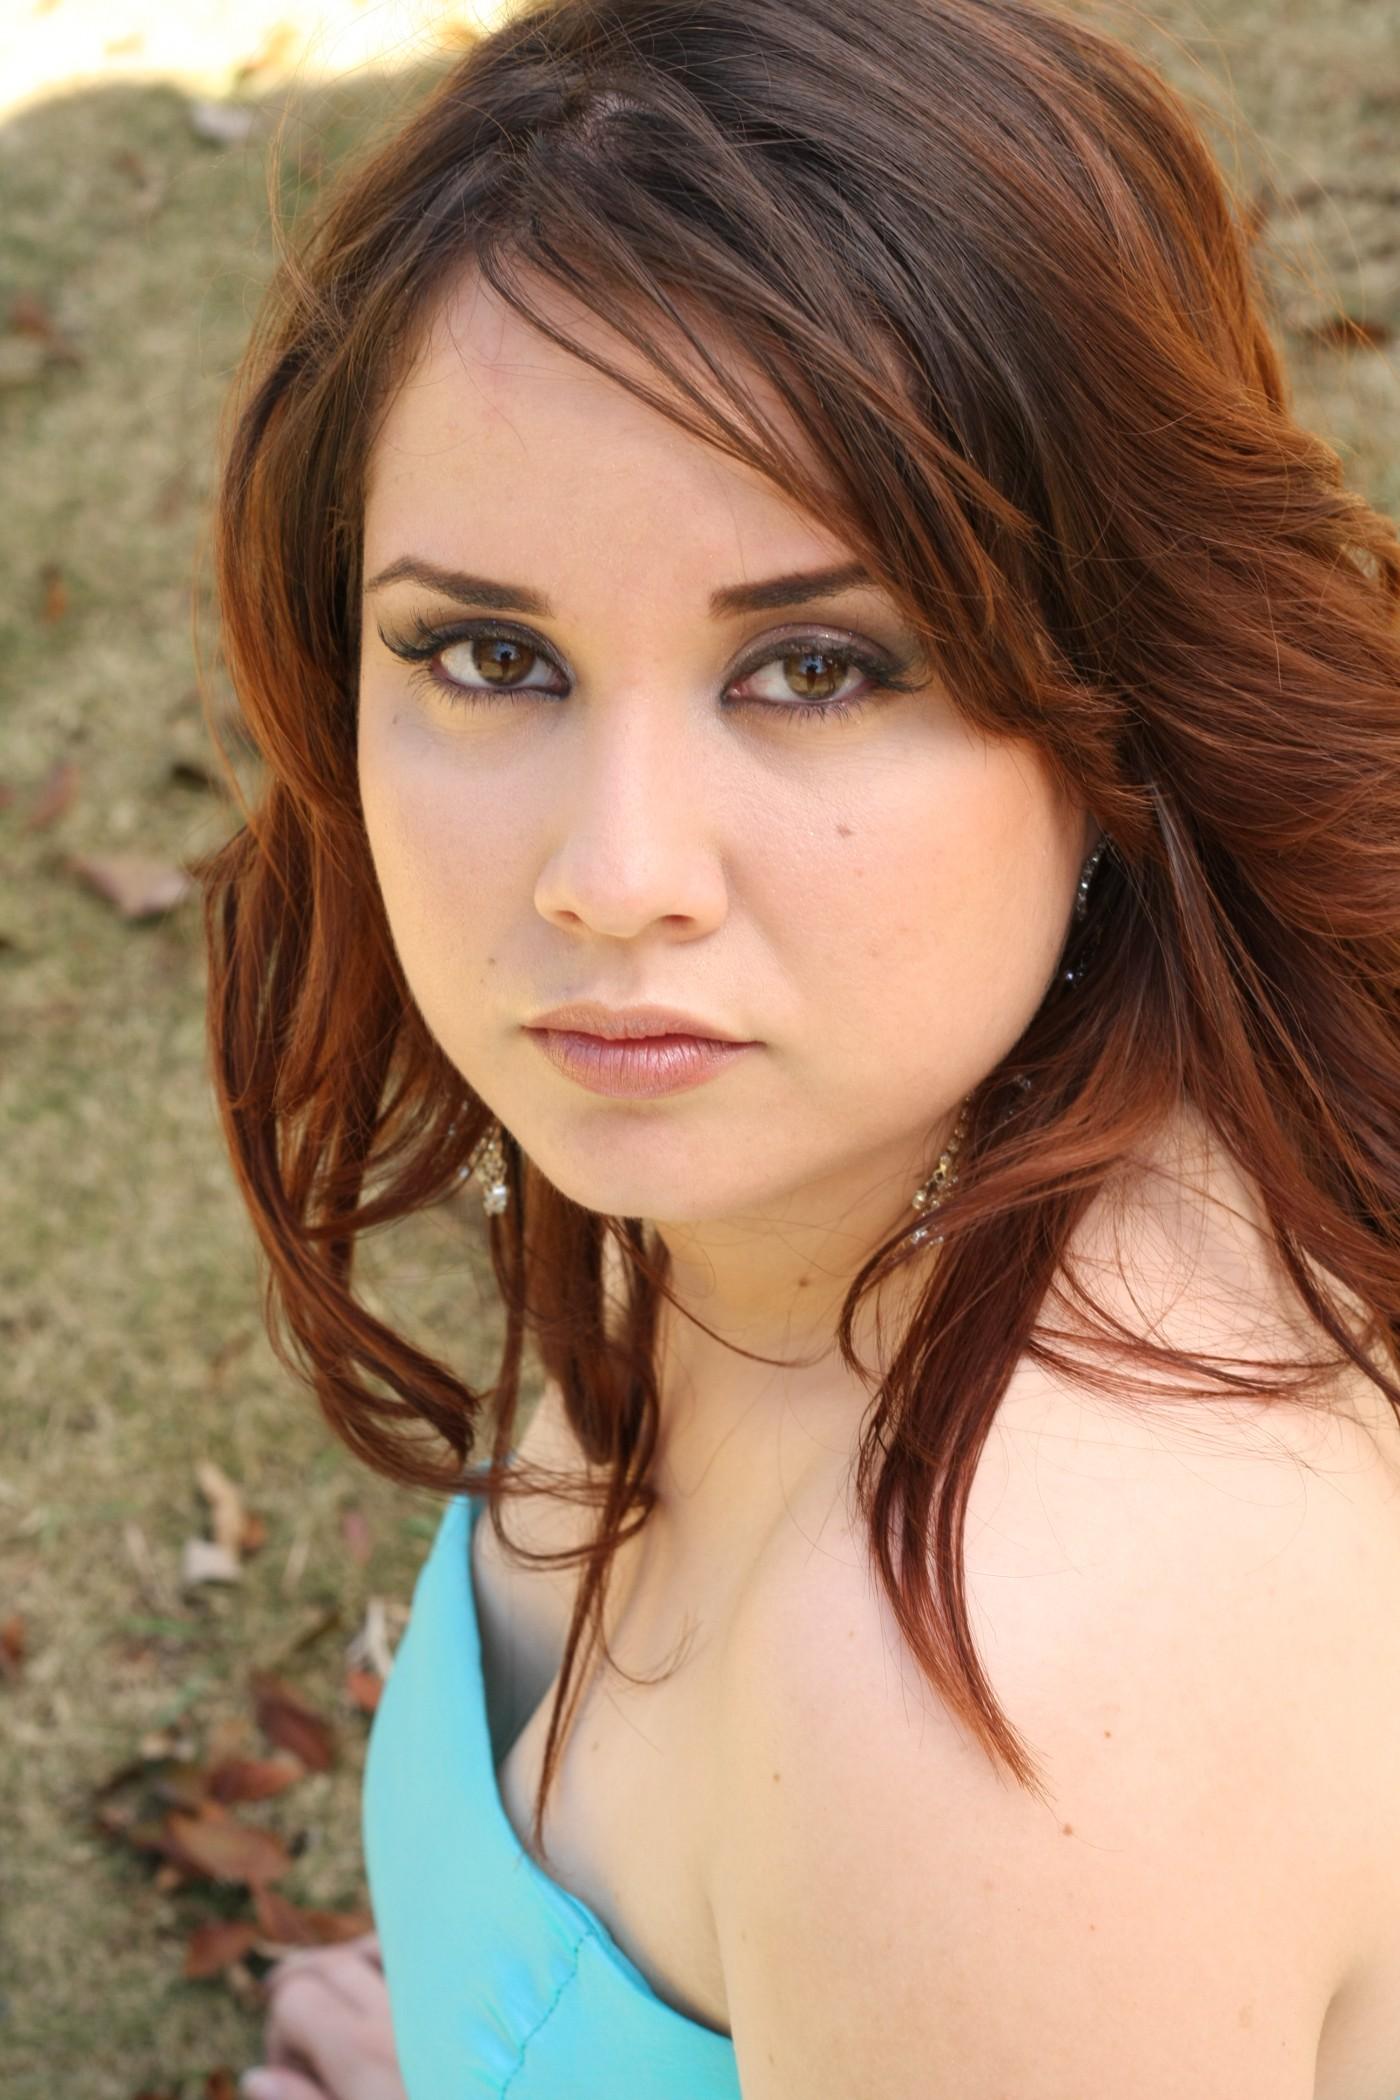 Abigail Santos Villalobos